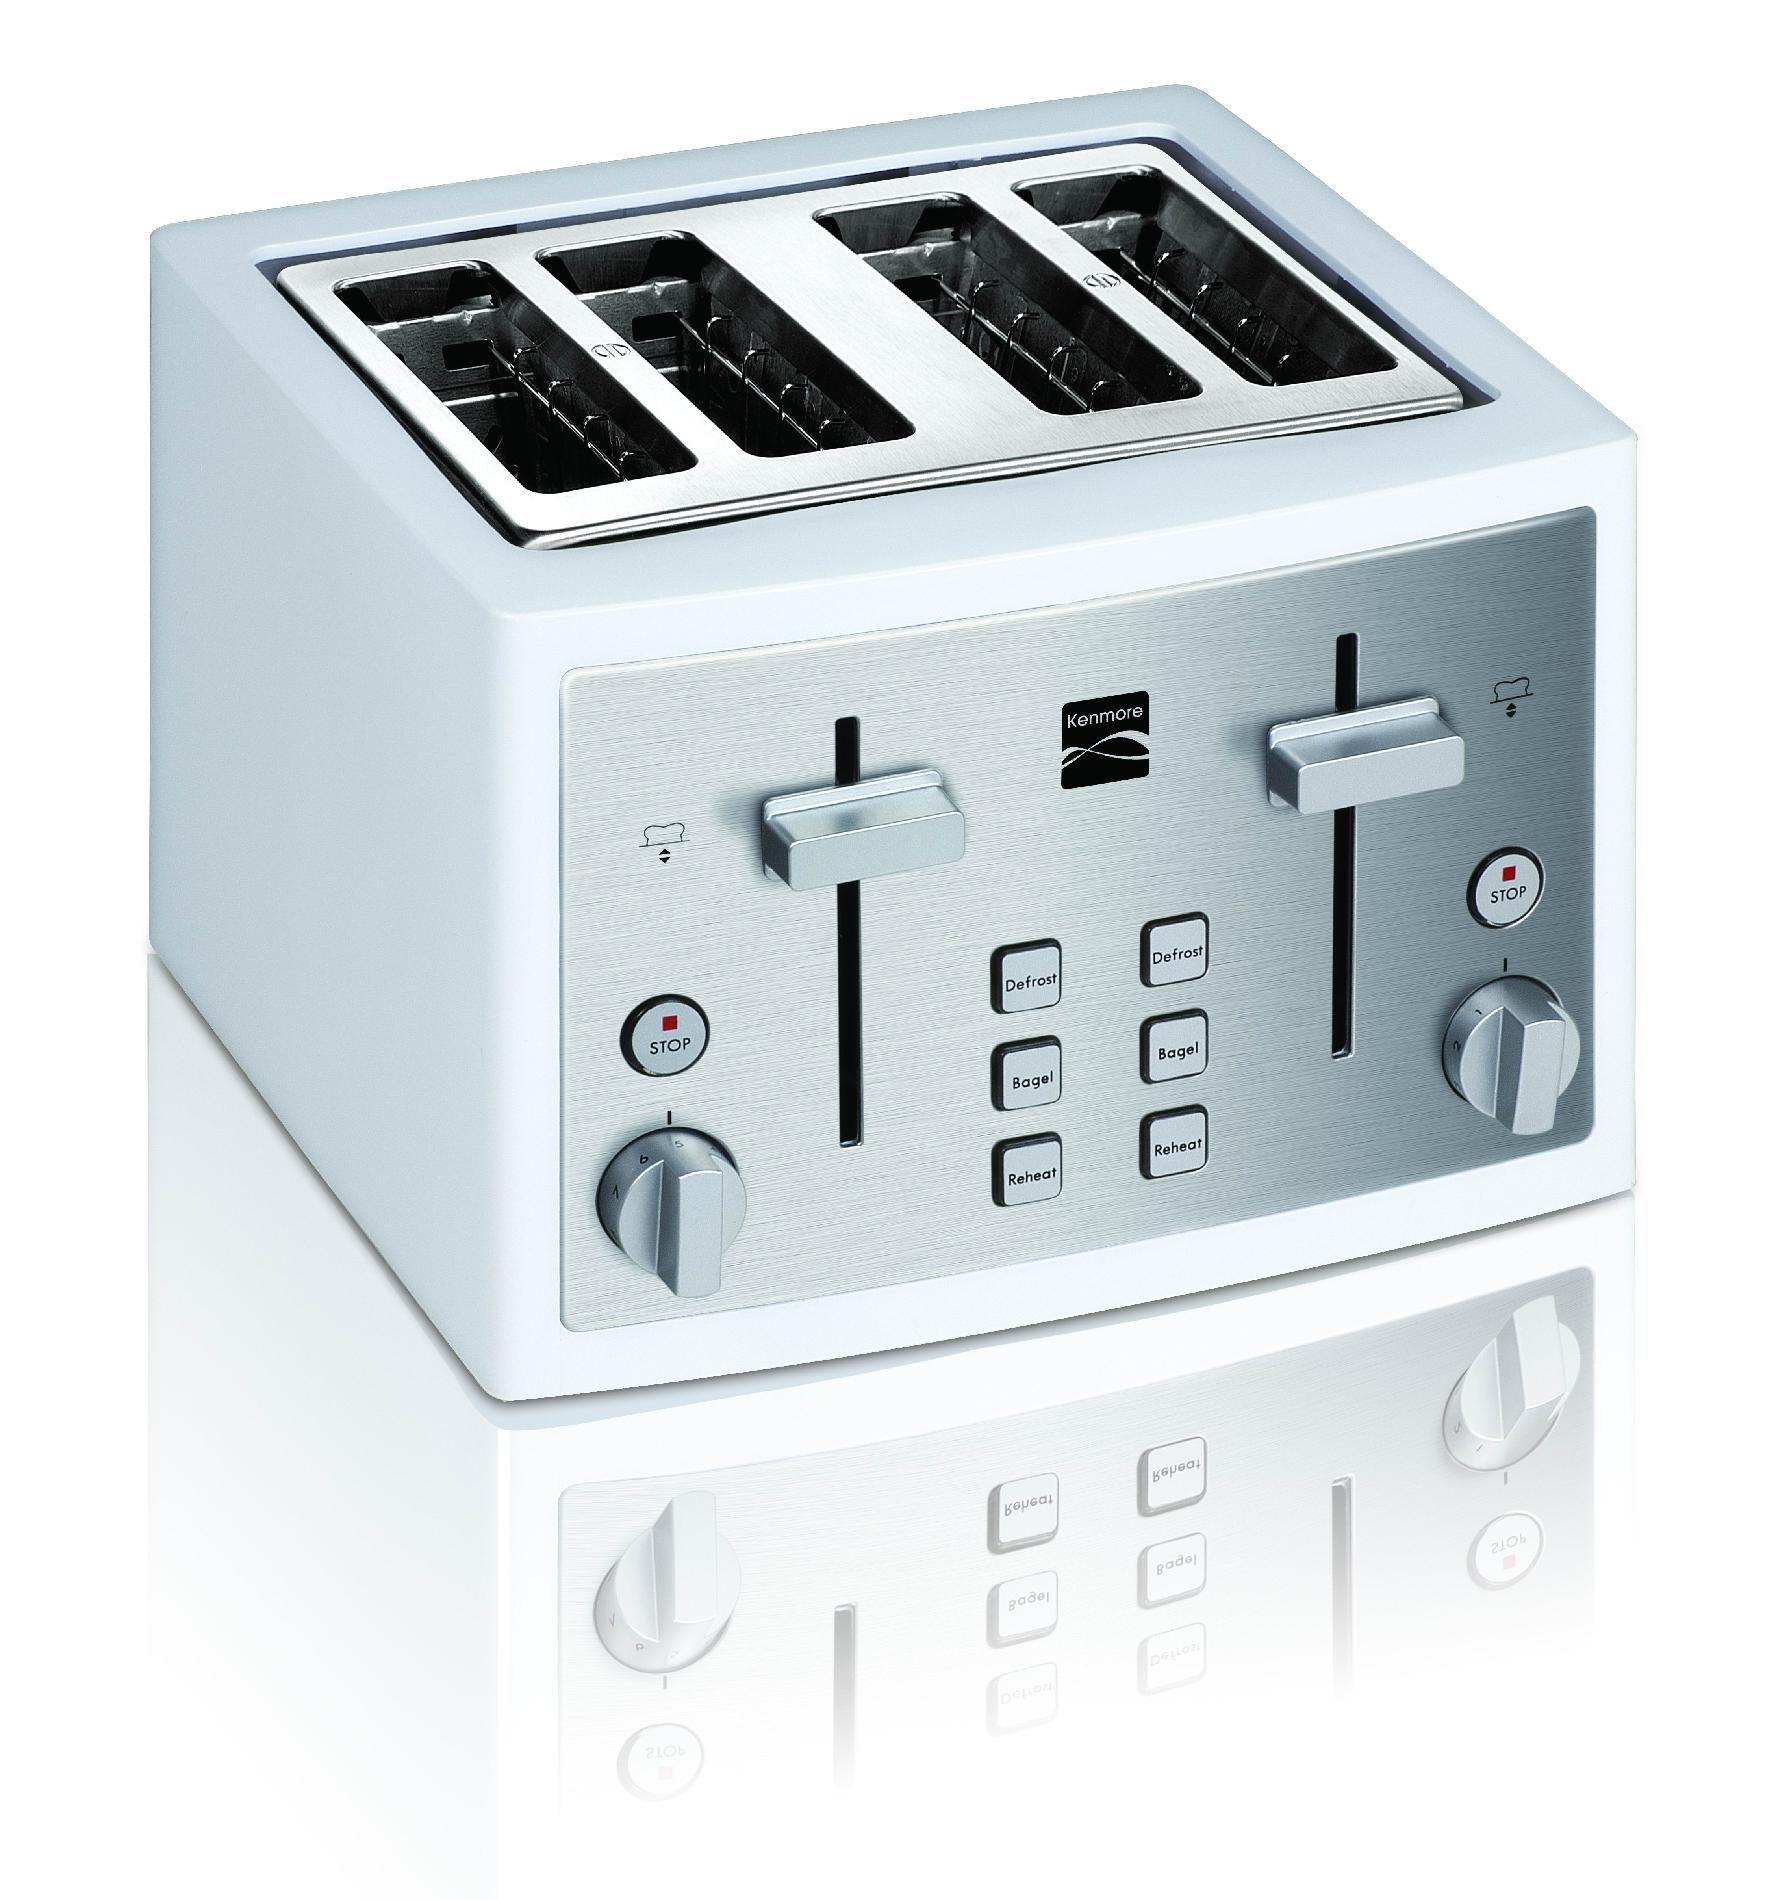 Kenmore 4-Slice Toaster, White